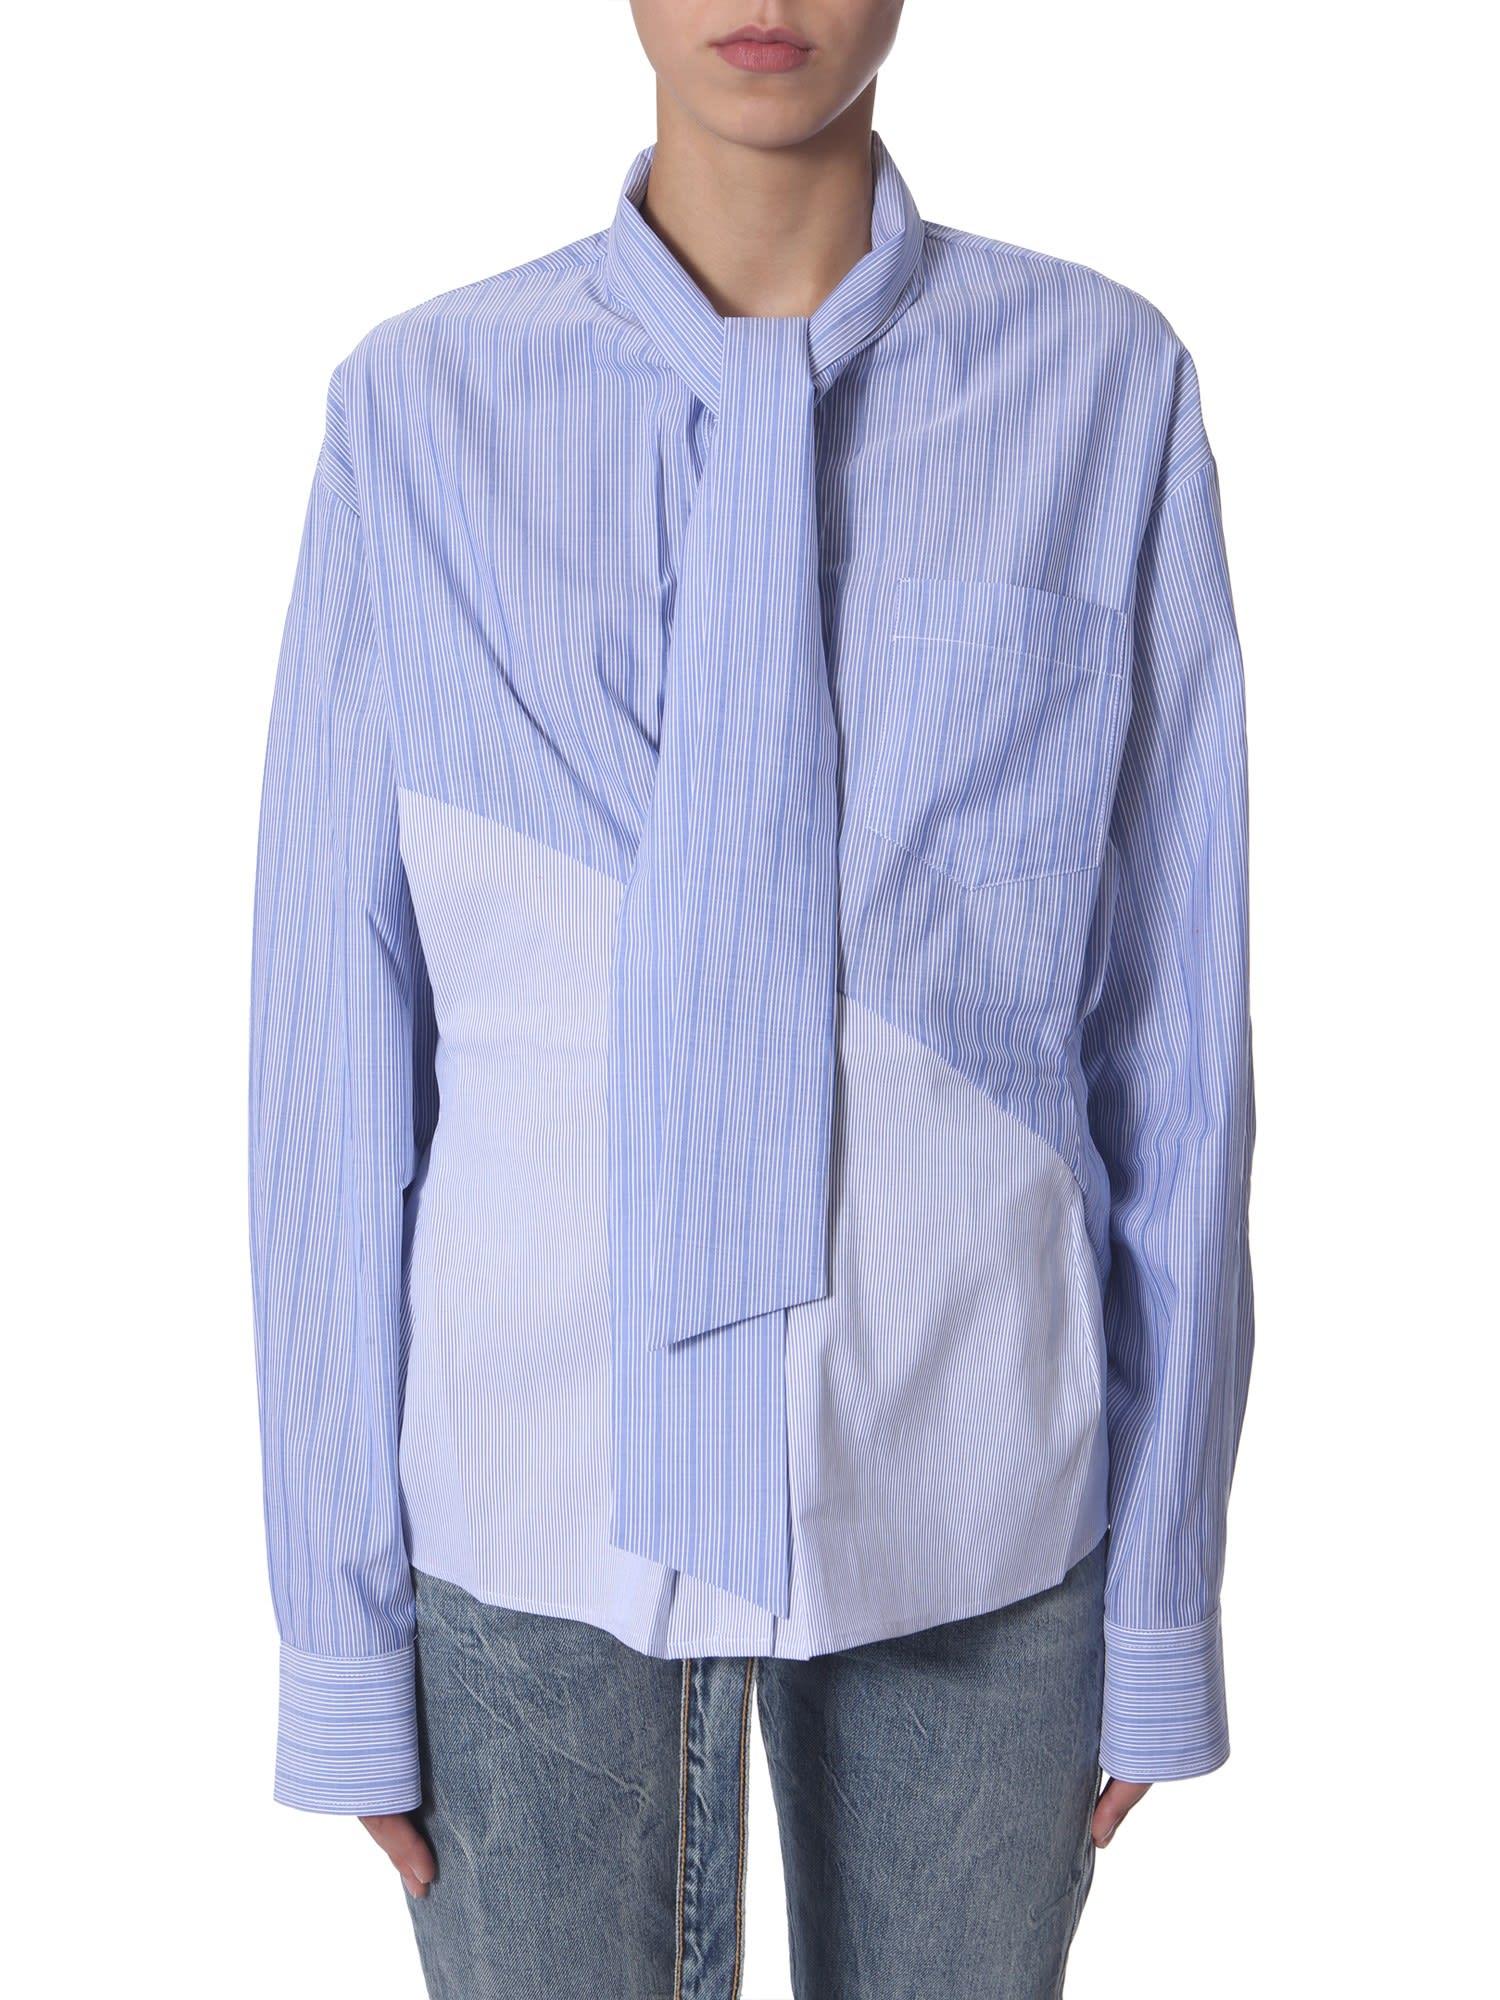 Ben Taverniti Unravel Project Oversize Fit Shirt